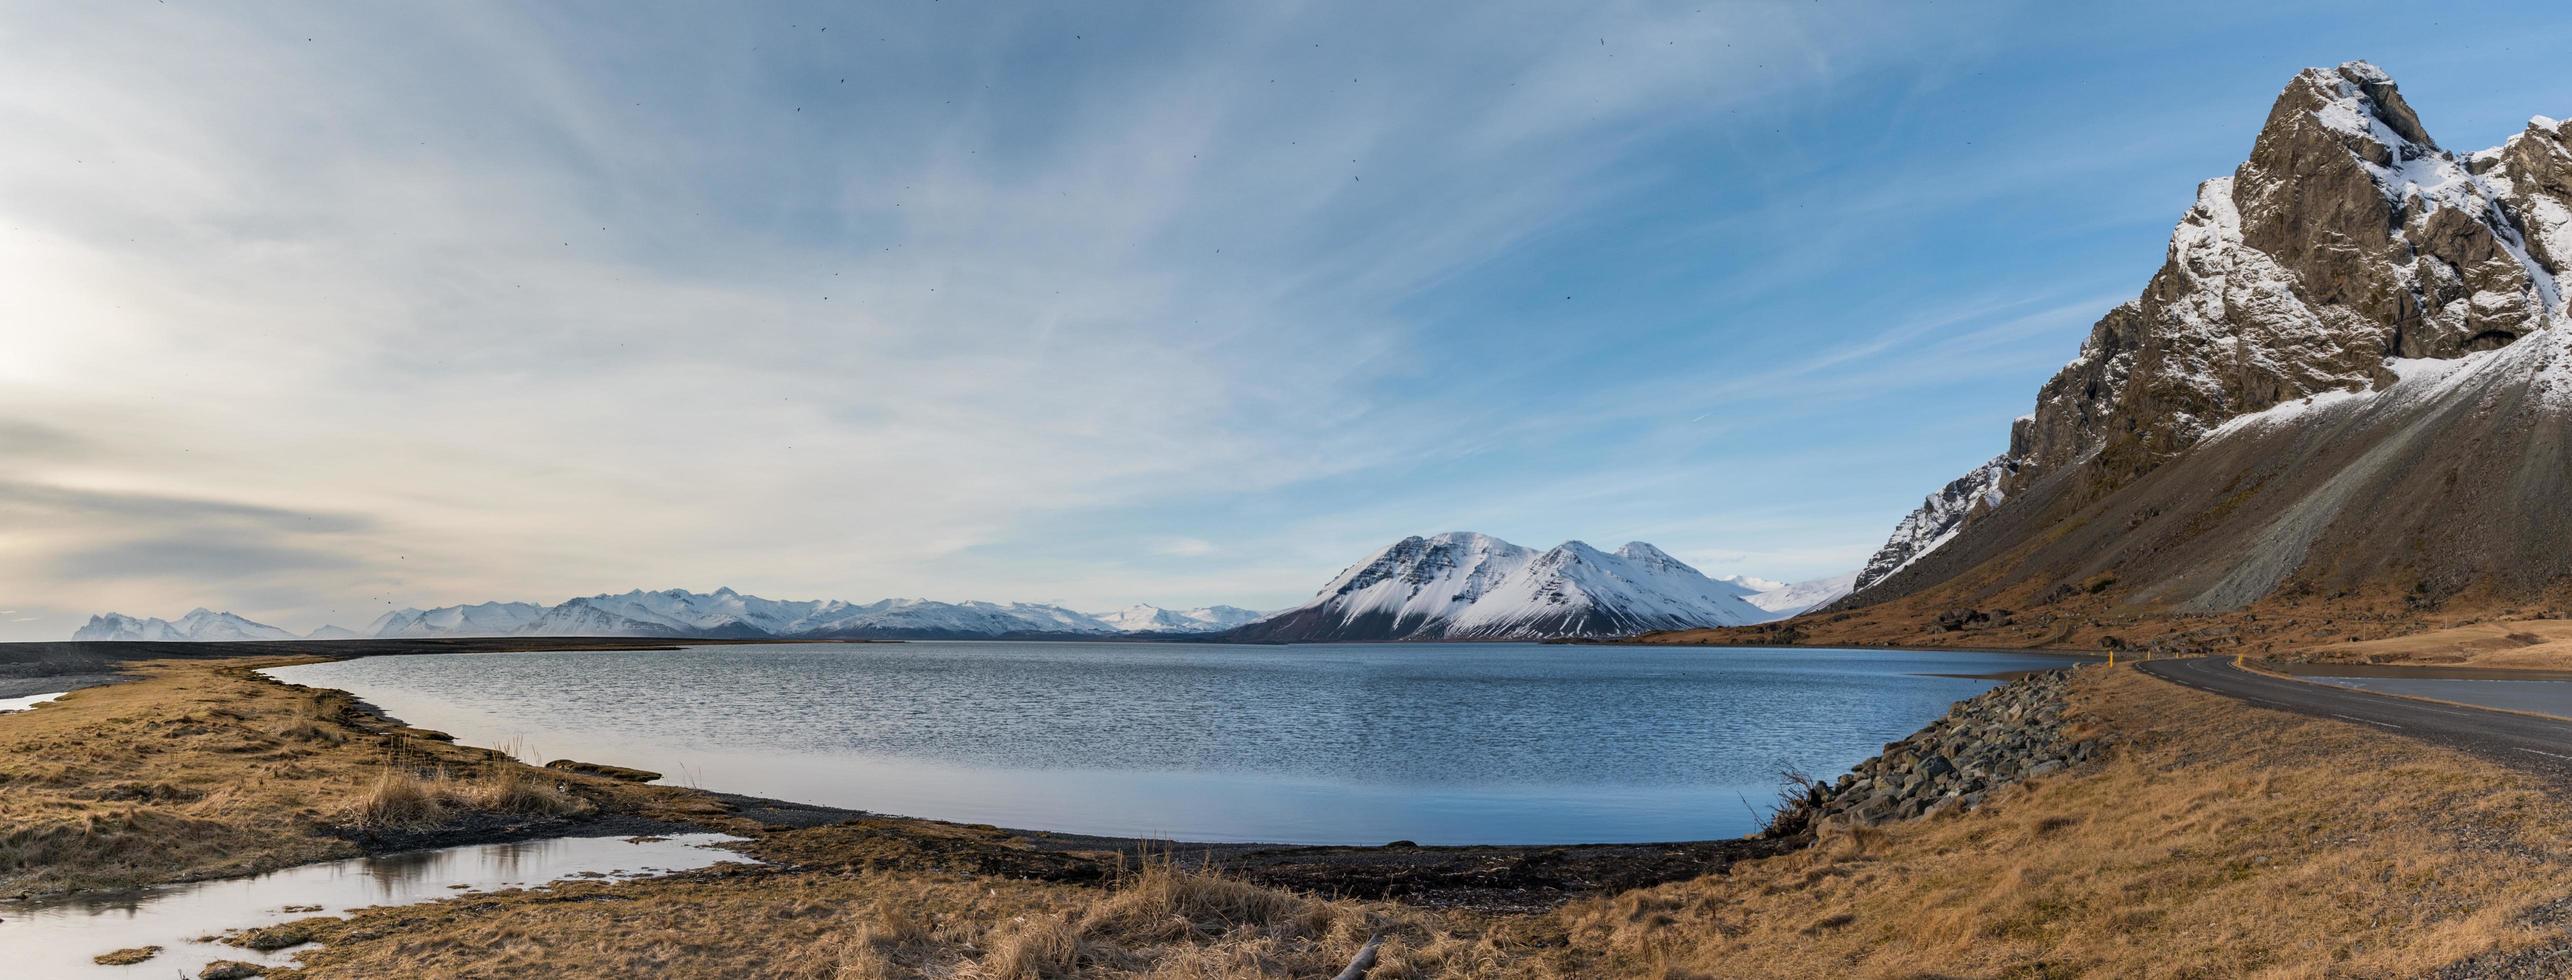 islandese panorama dell'isola djupivogur foto